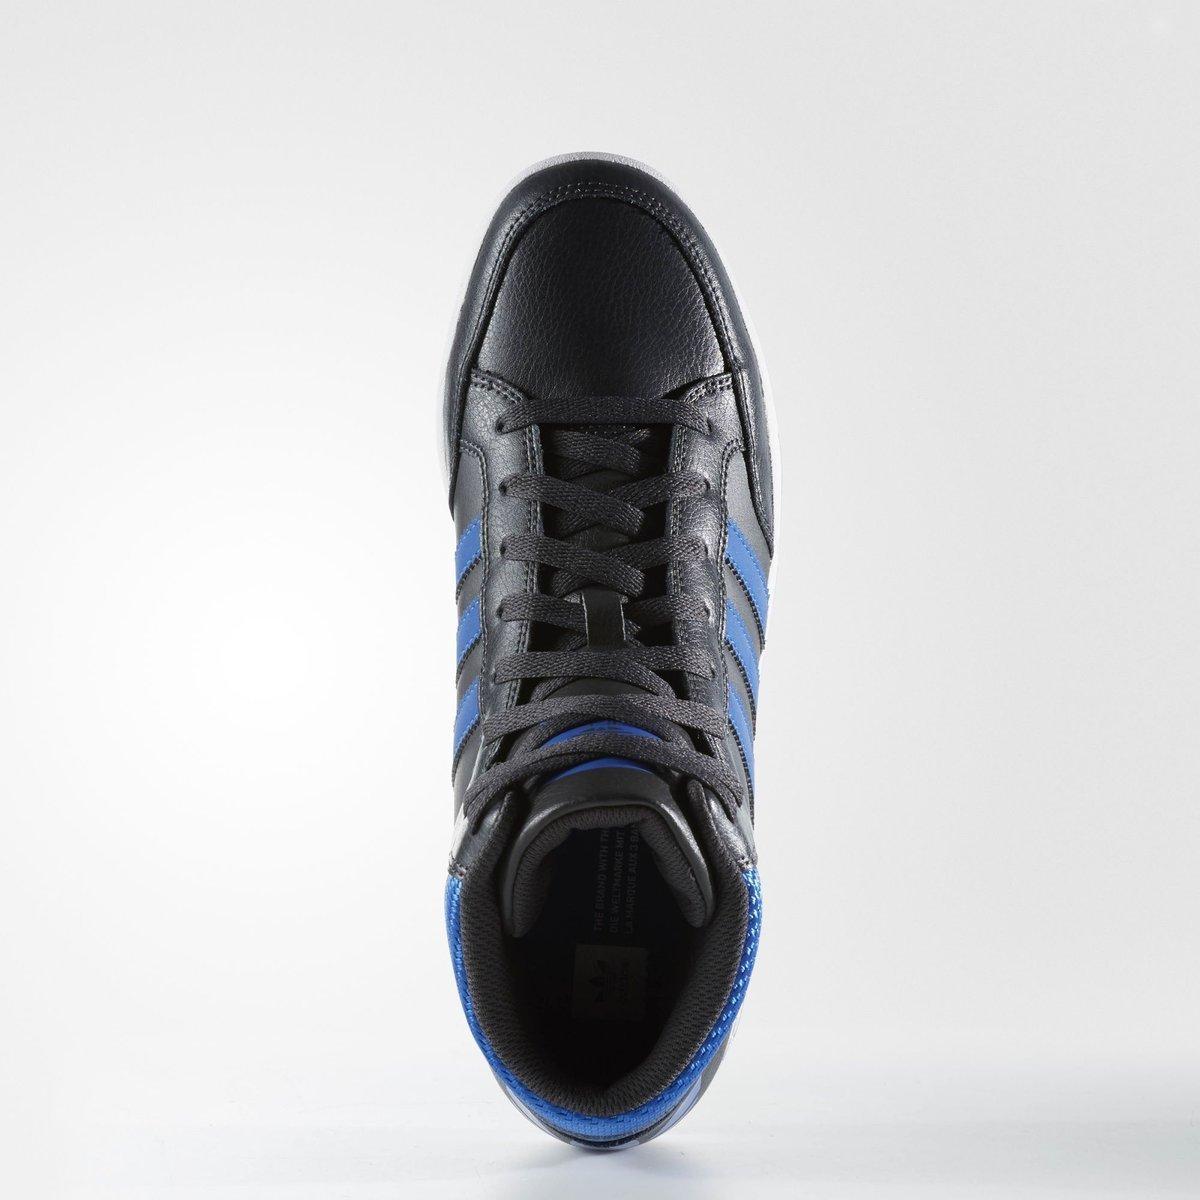 Buty Adidas Originals Varial Mid BB8770